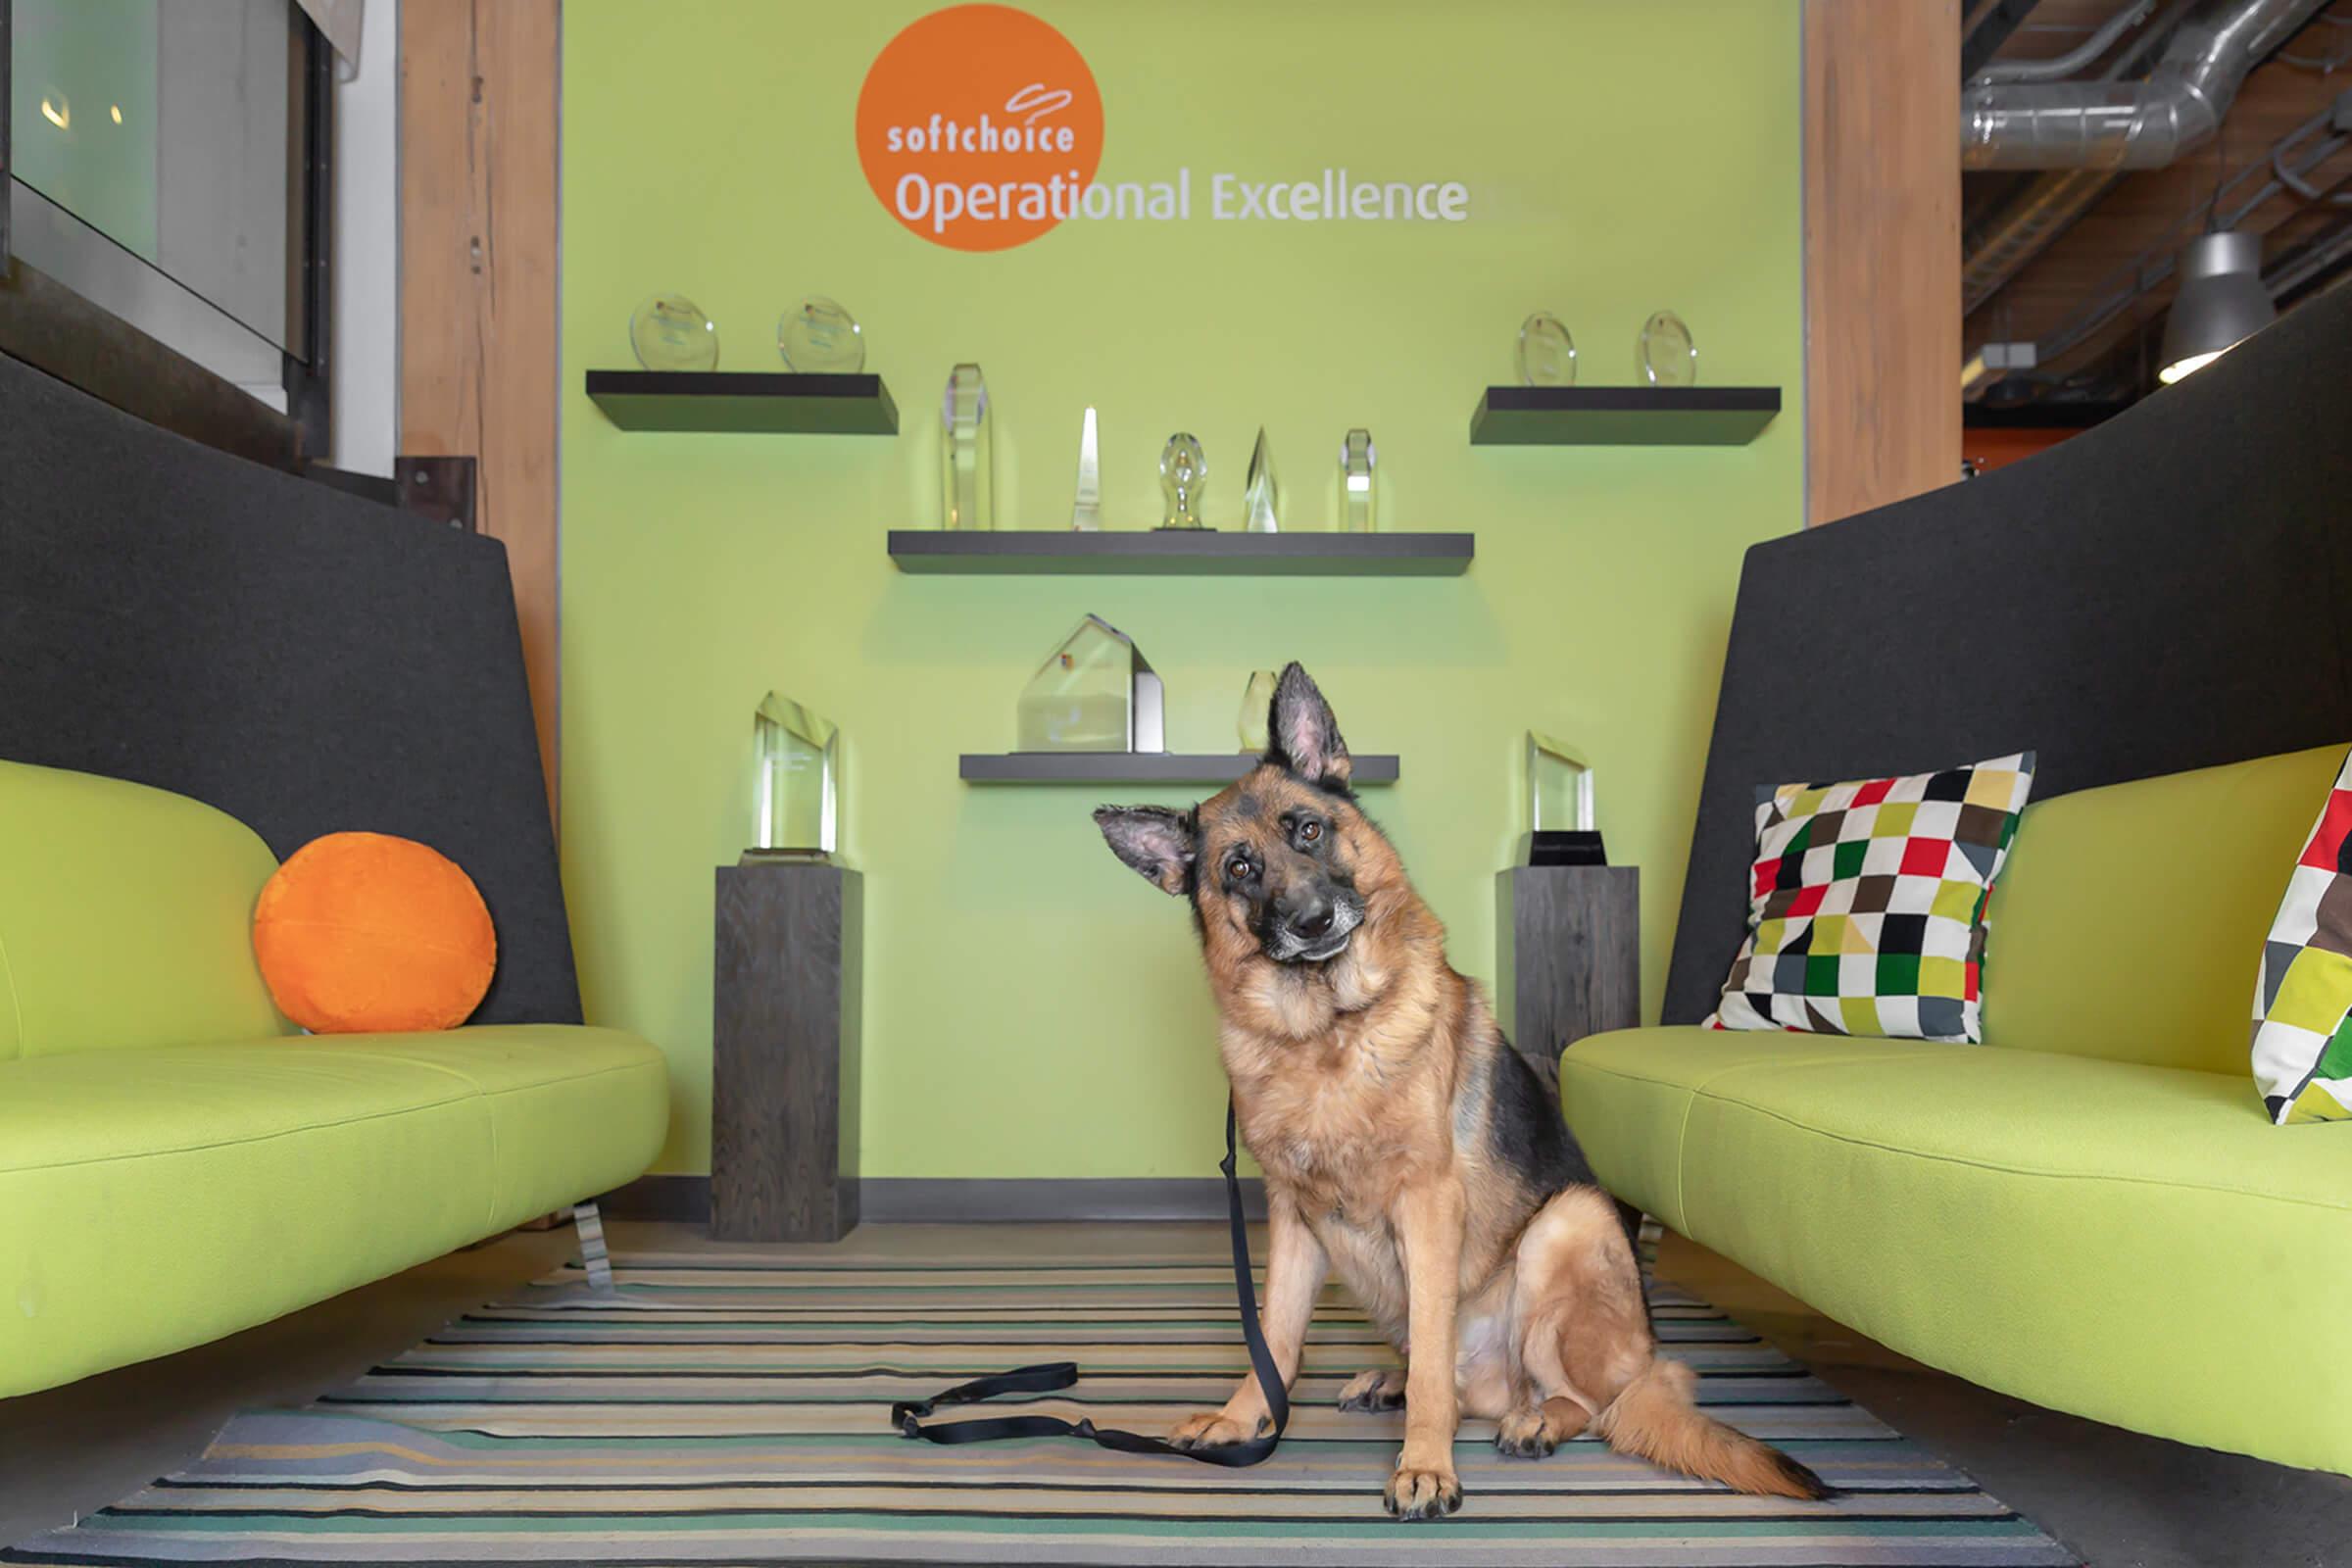 german shepherd dog in Toronto office